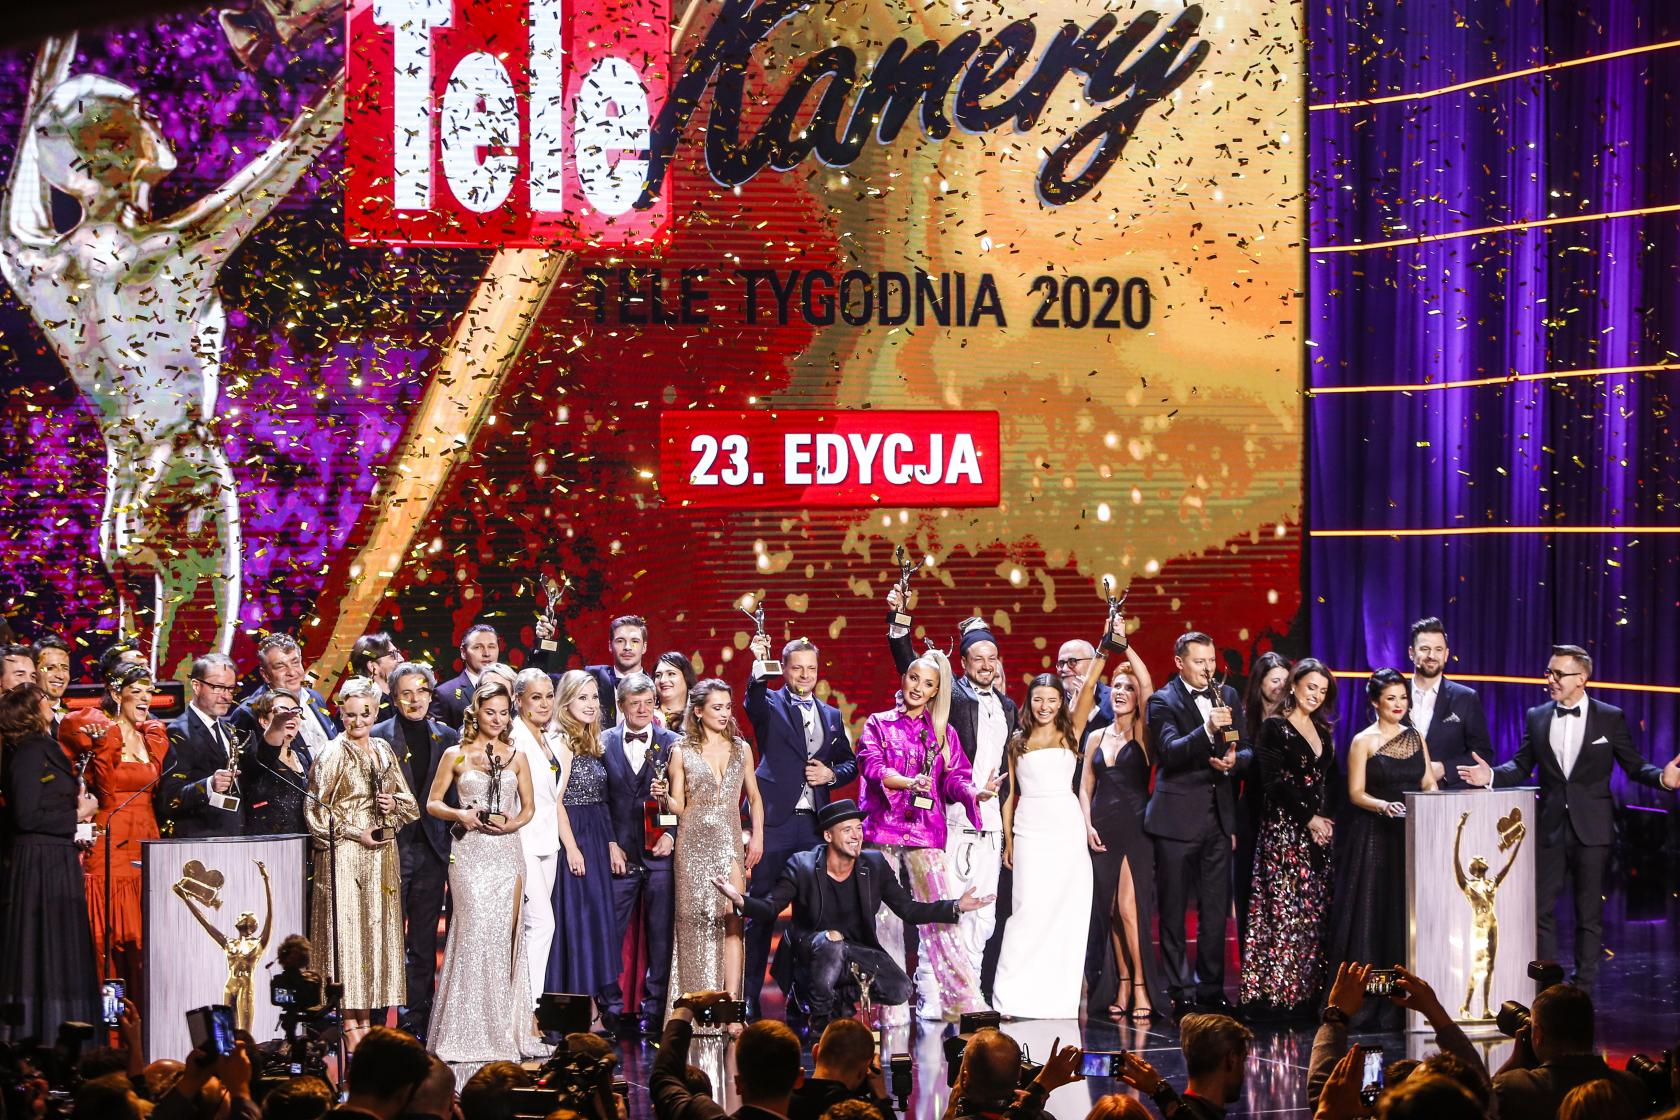 BlogStar: Telekamery Tele Tygodnia 2020 - BlogStar.pl